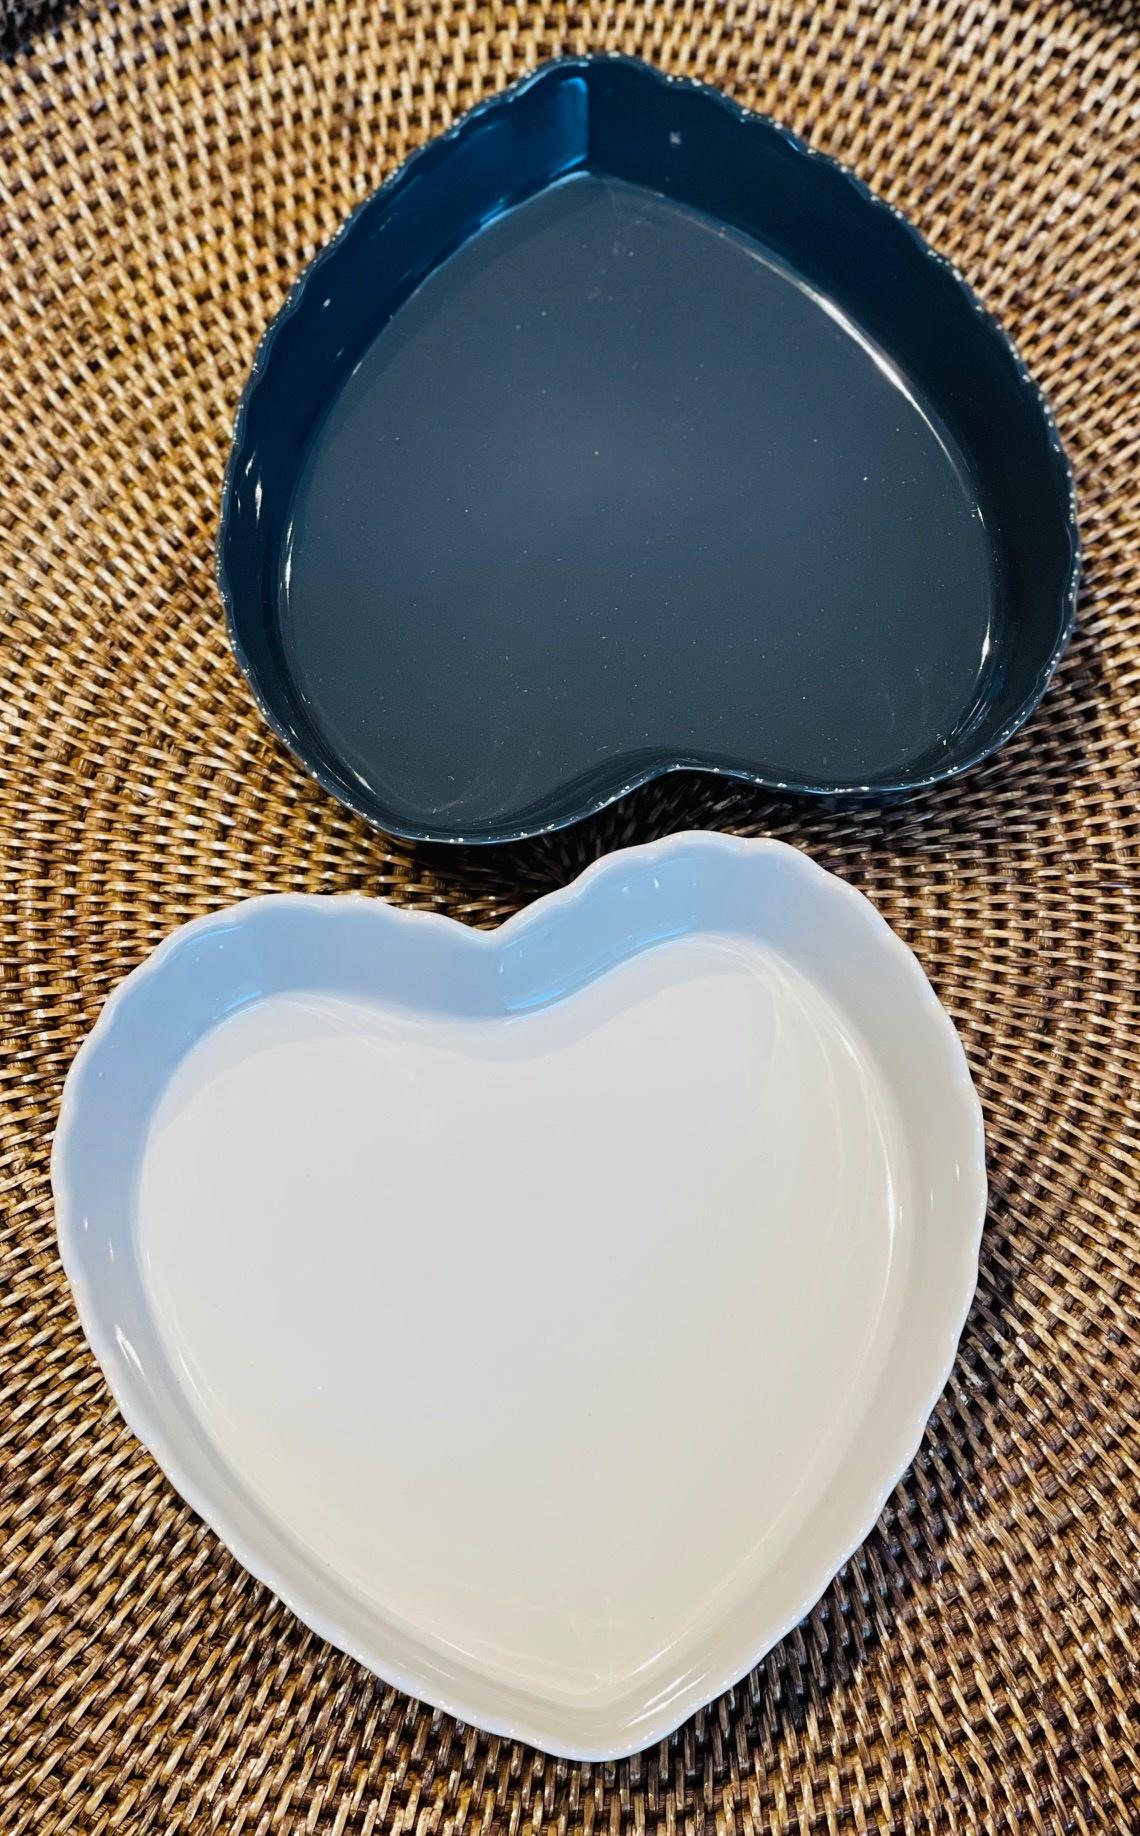 Feston Oven Dish - Heart - Dk Grey-1